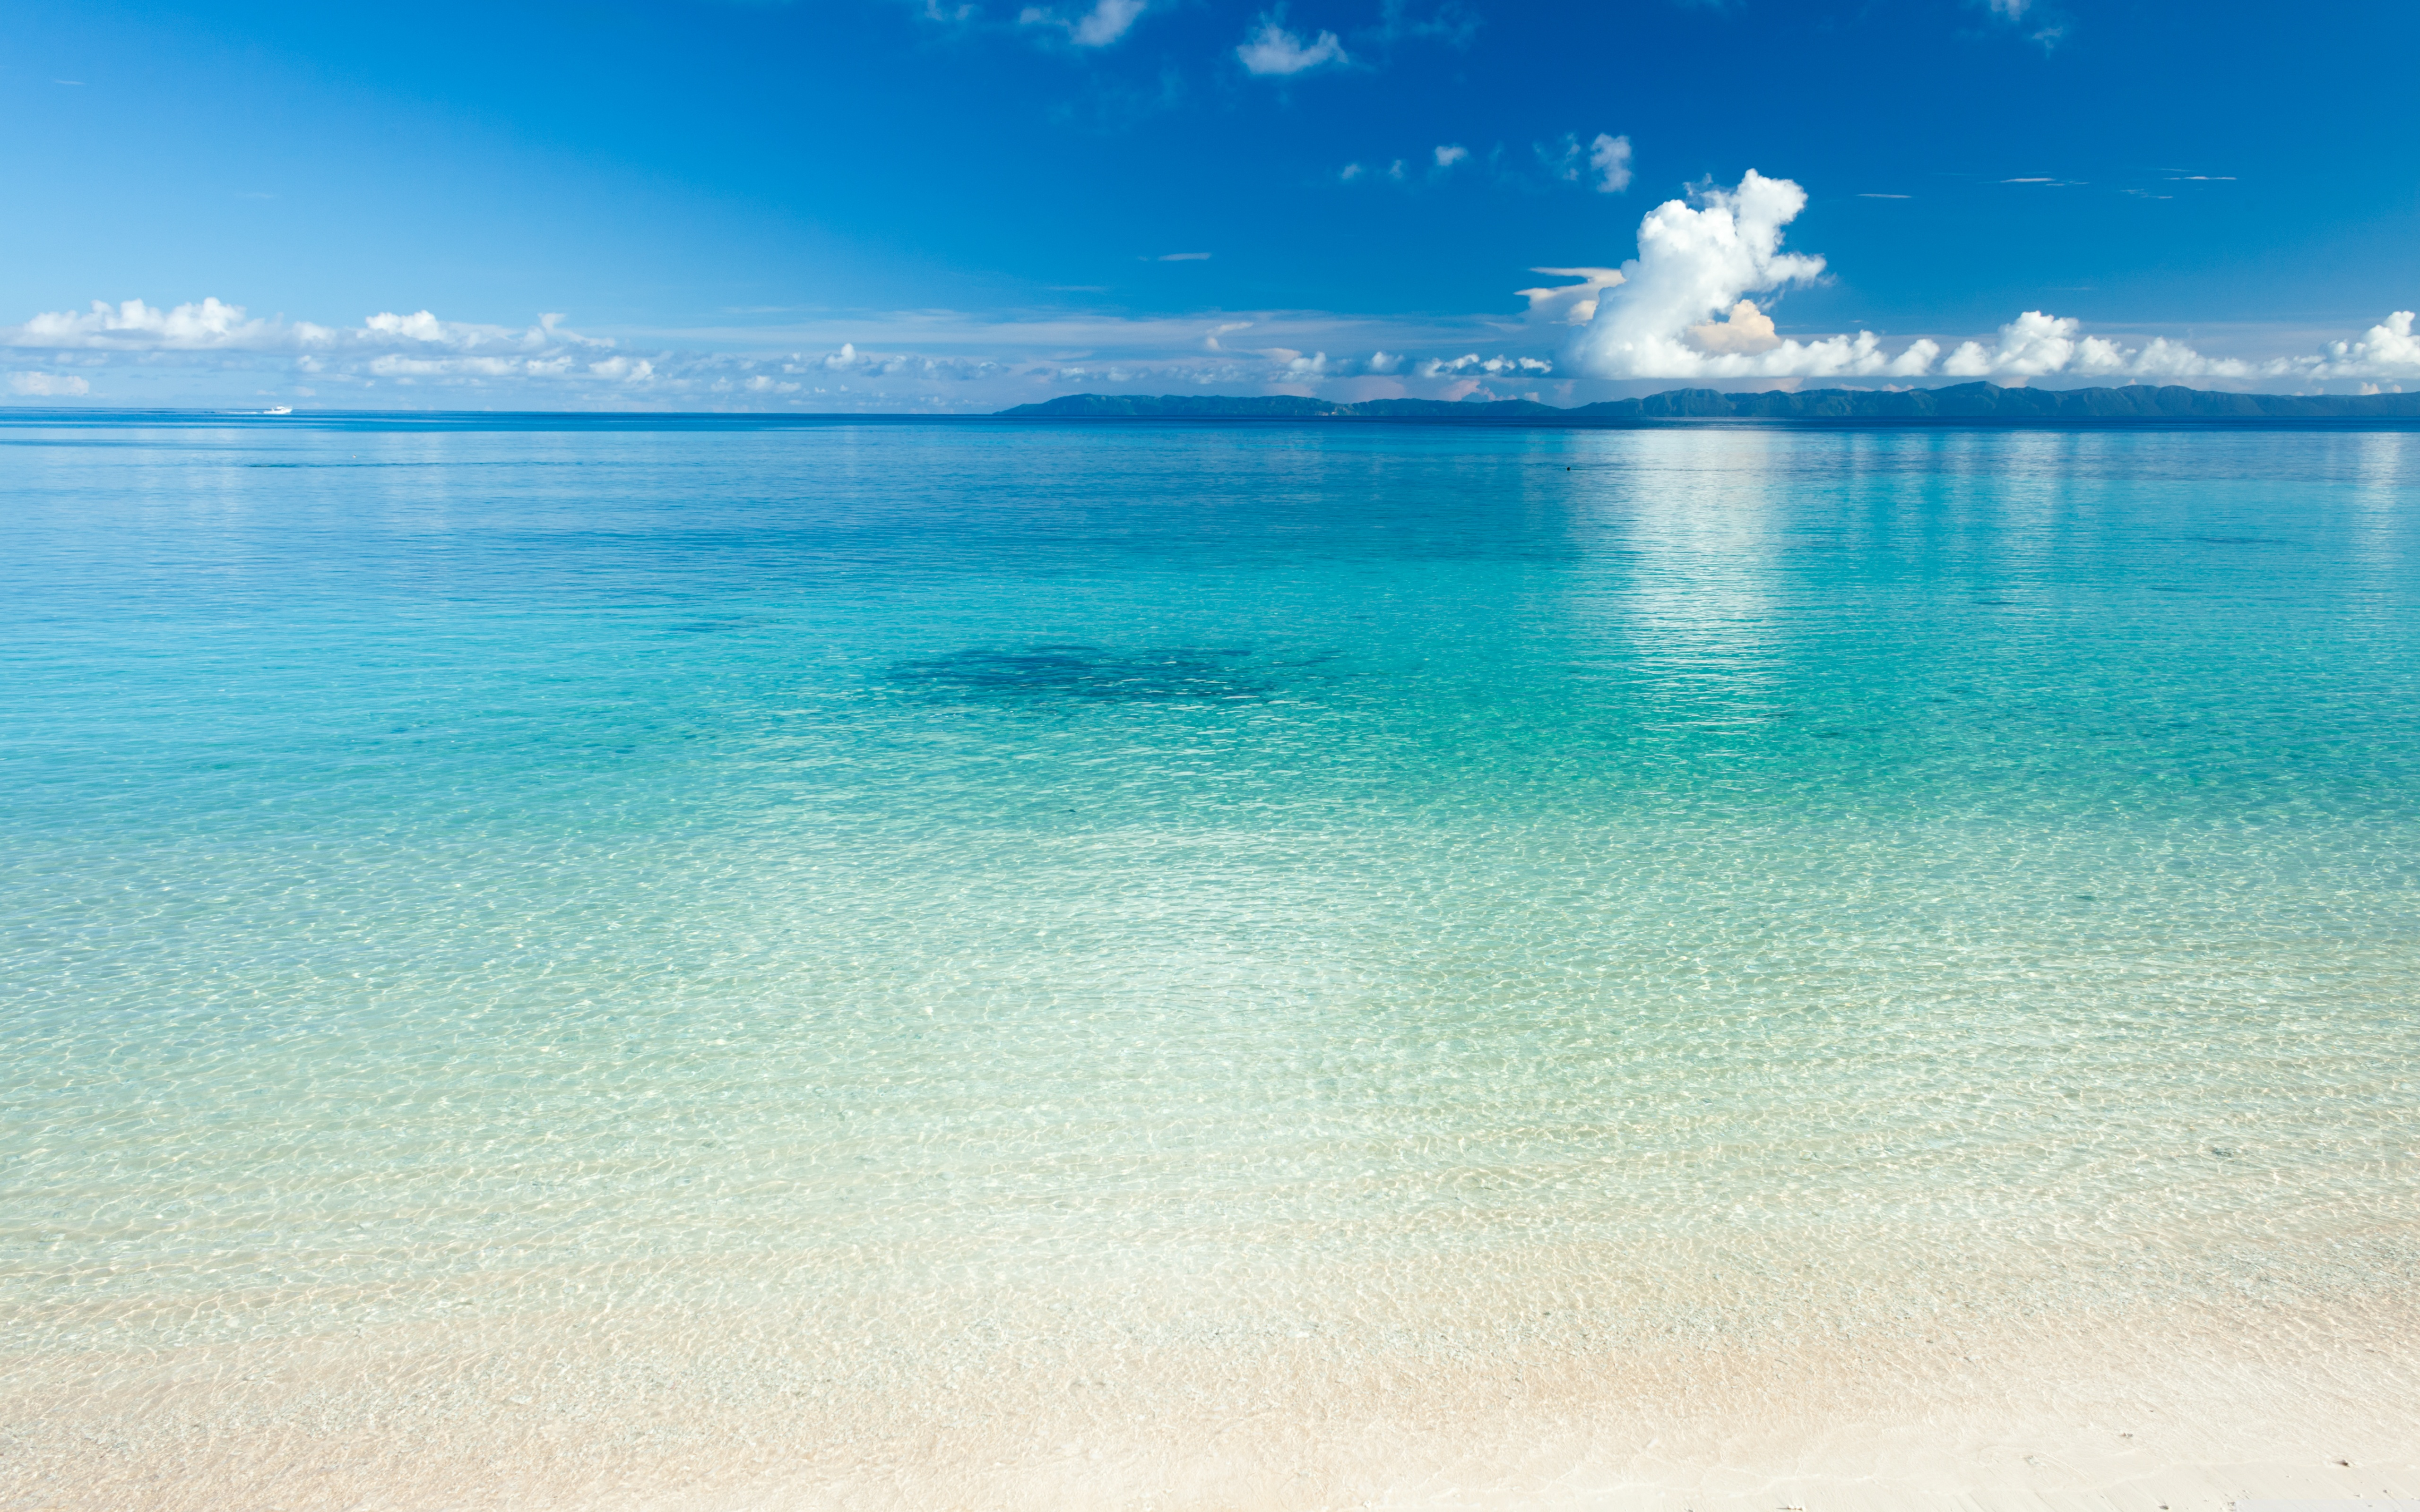 Seaside Wallpapers Top Free Seaside Backgrounds